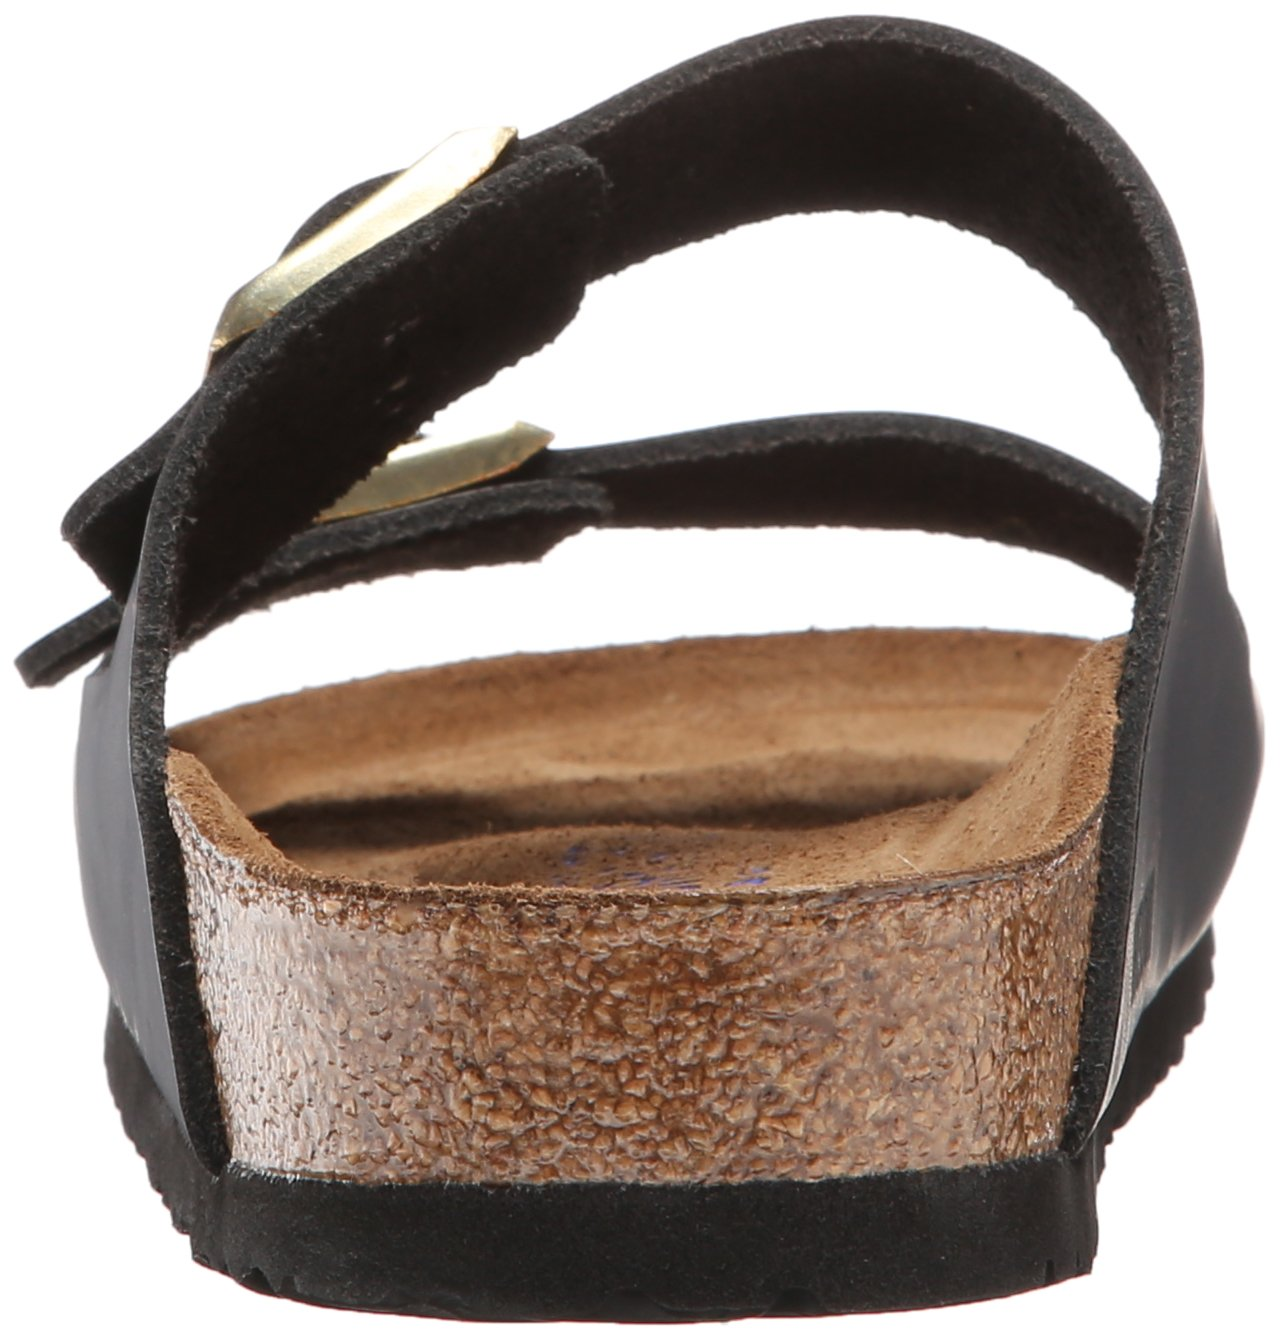 Birkenstock Unisex Arizona Hunter Black Leather Sandals - 9-9.5 2A(N) US Women/7-7.5 2A(N) US Men by Birkenstock (Image #2)